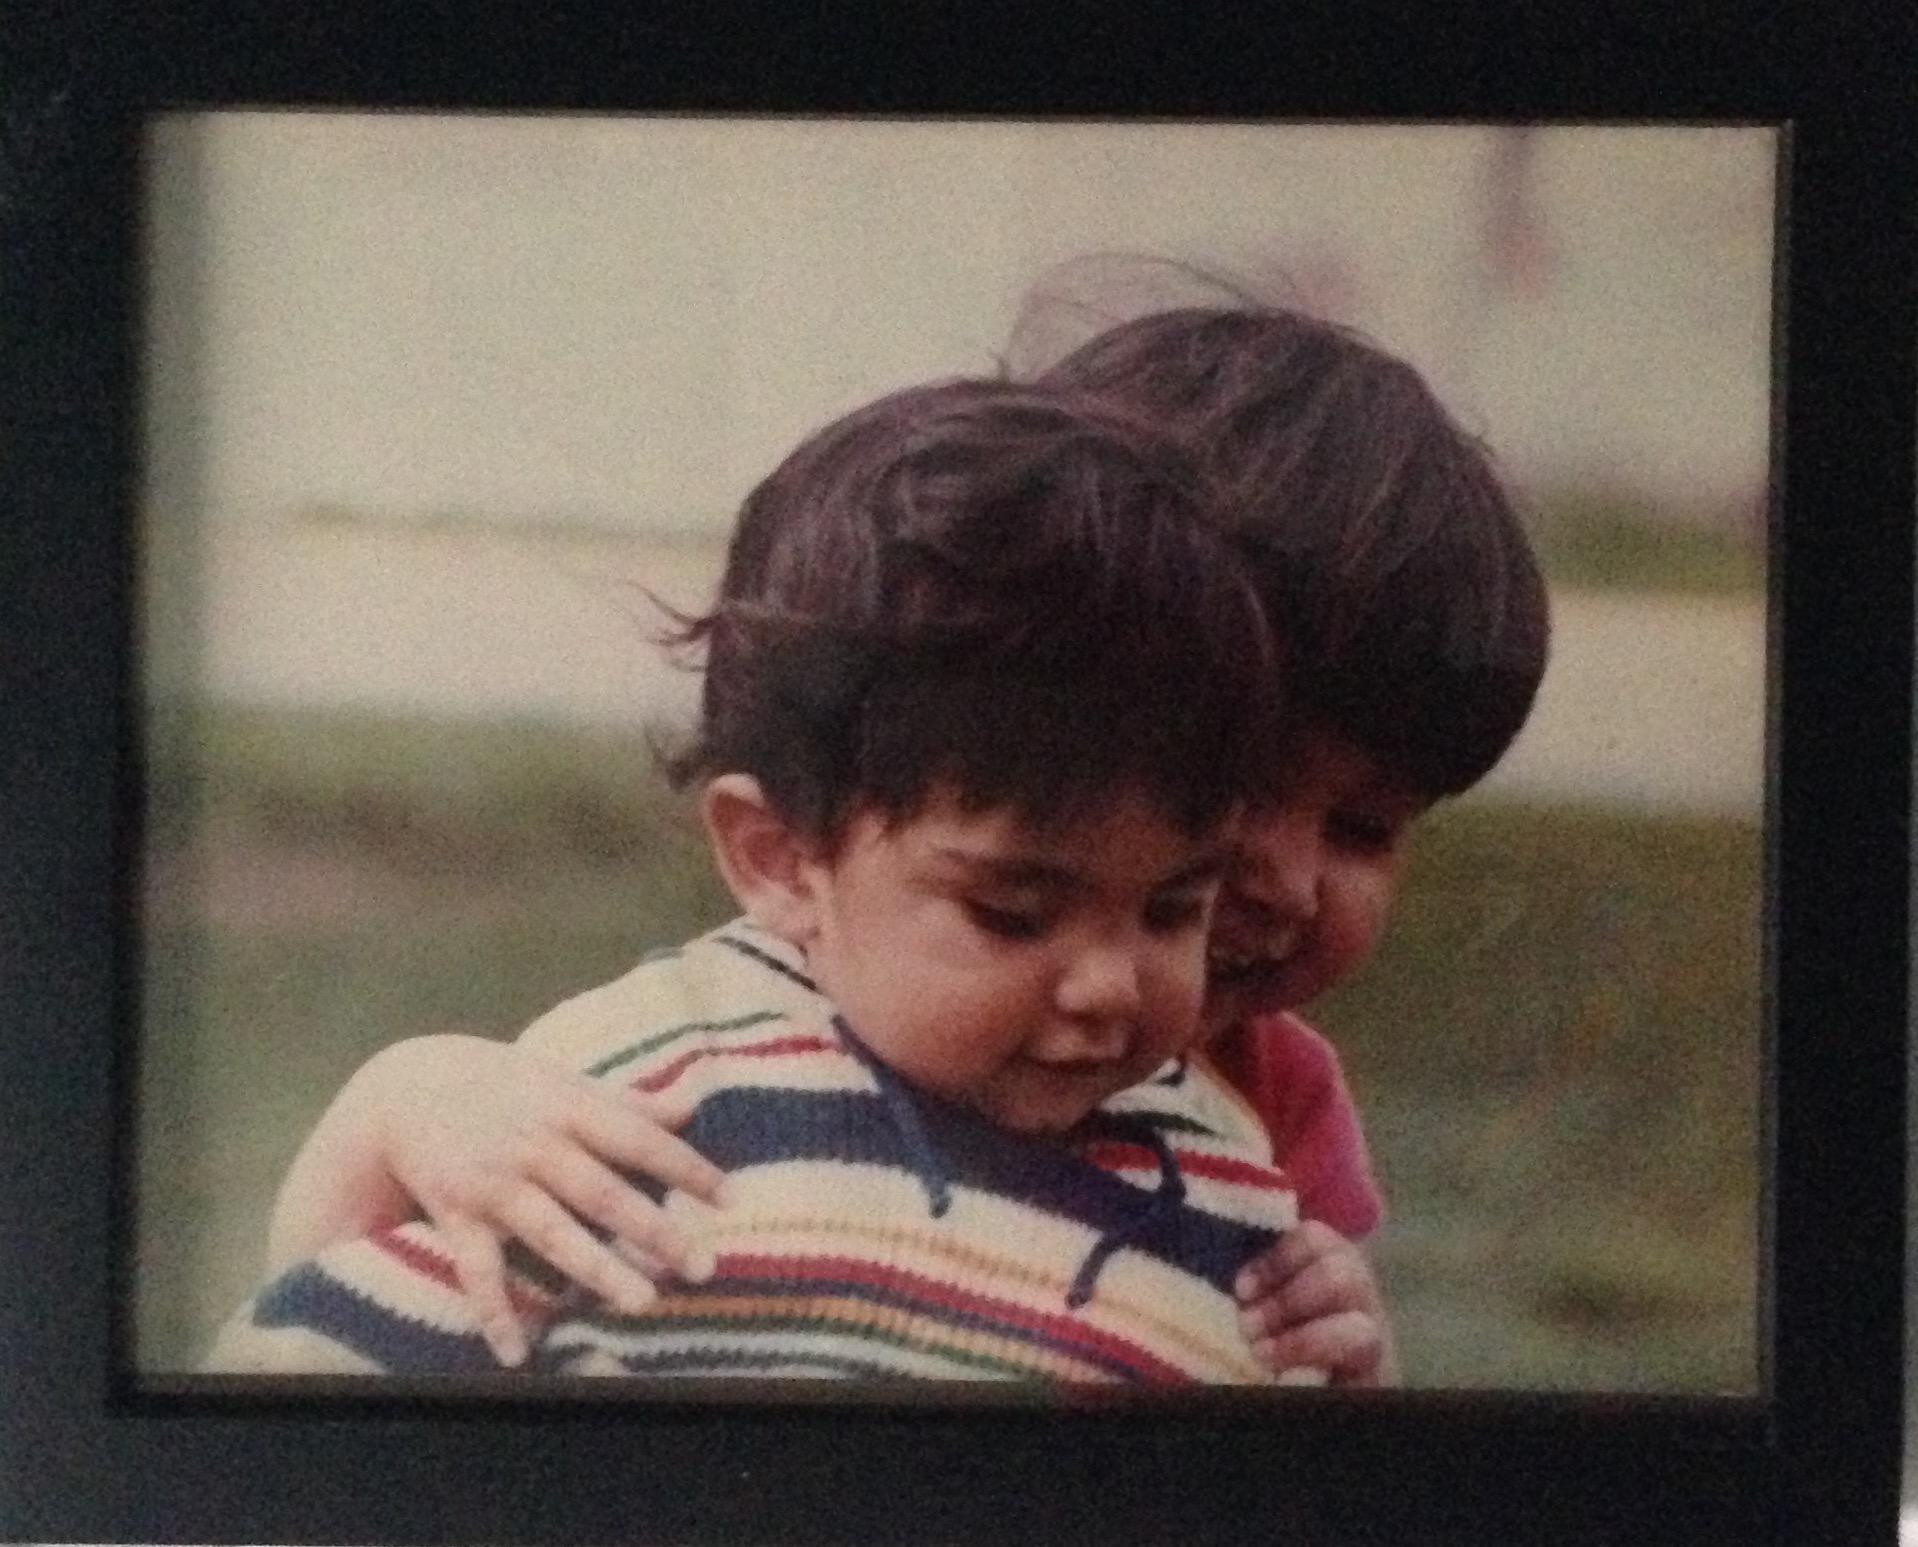 Antonio & Lorena circa 1982. Photo Credit: Lorena Giron Orozco